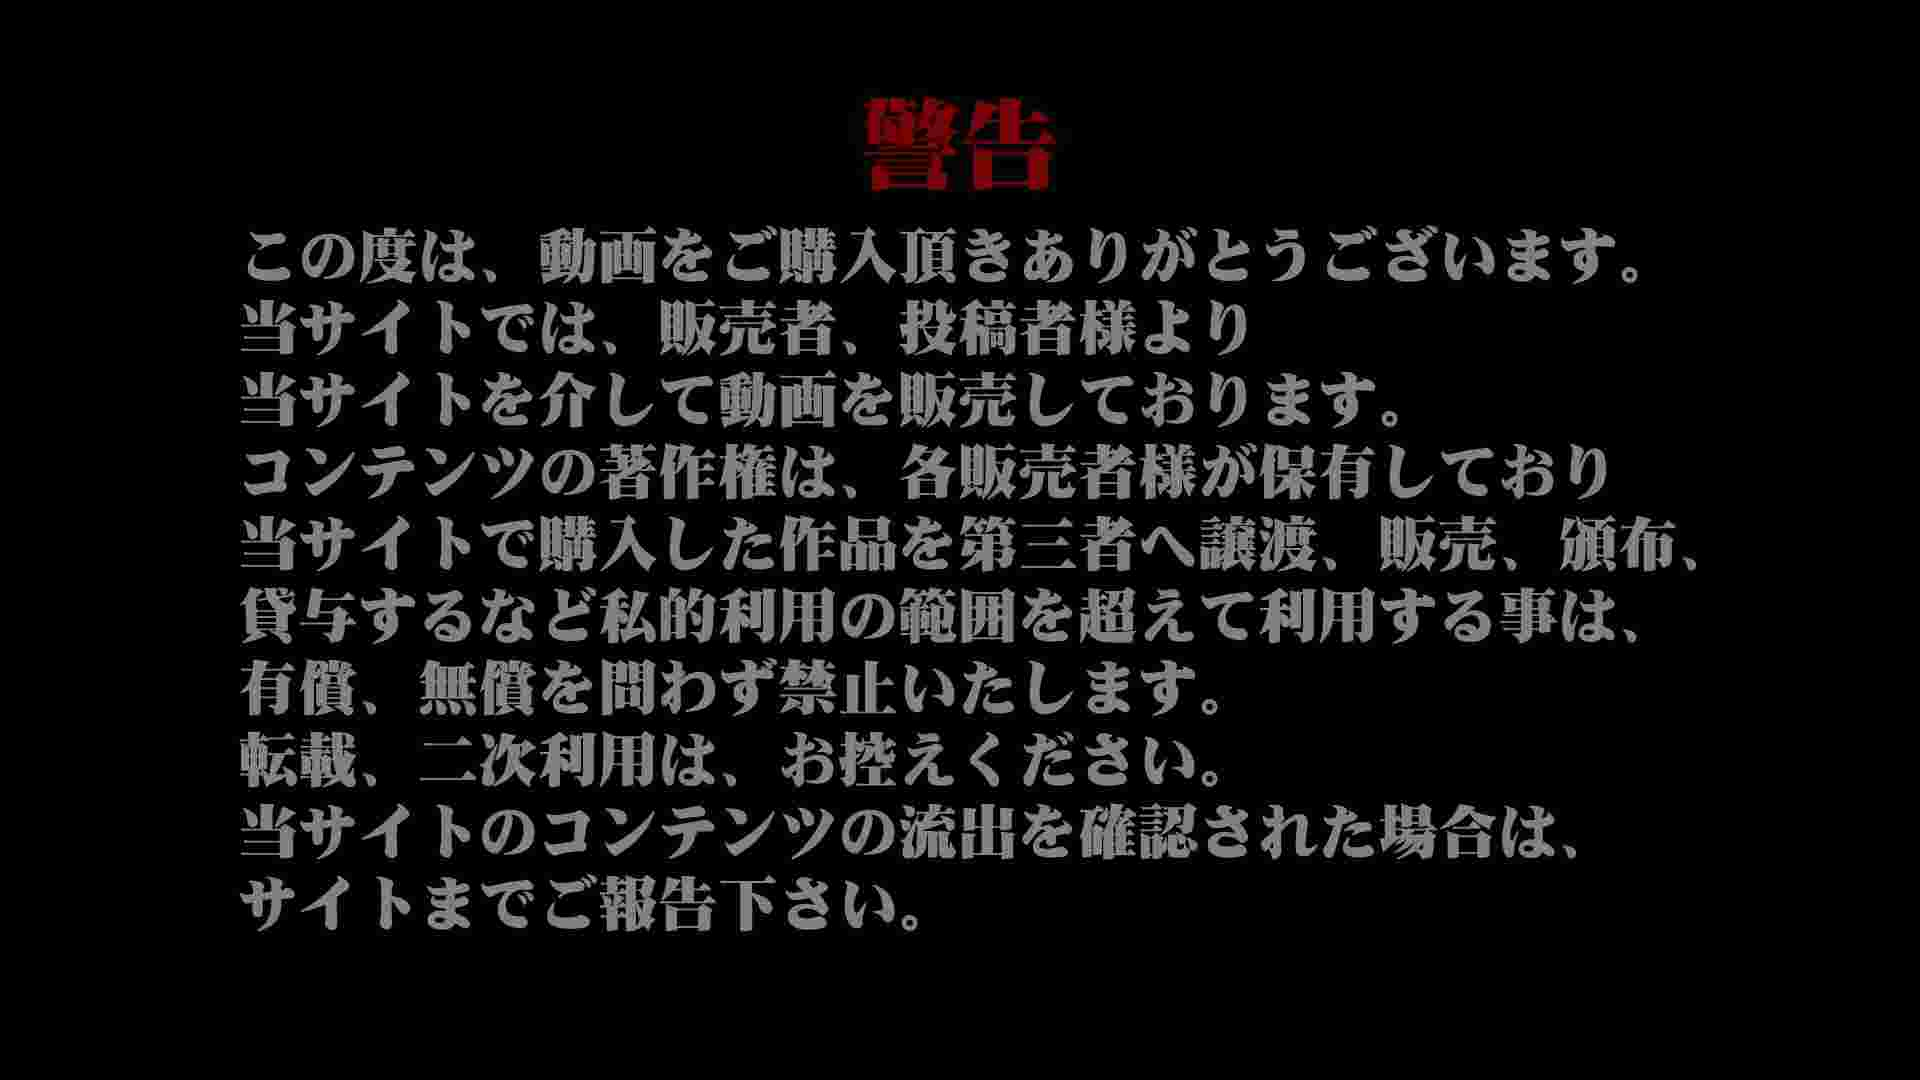 Aquaな露天風呂Vol.981 露天風呂編 | 盗撮シリーズ  104PIX 1